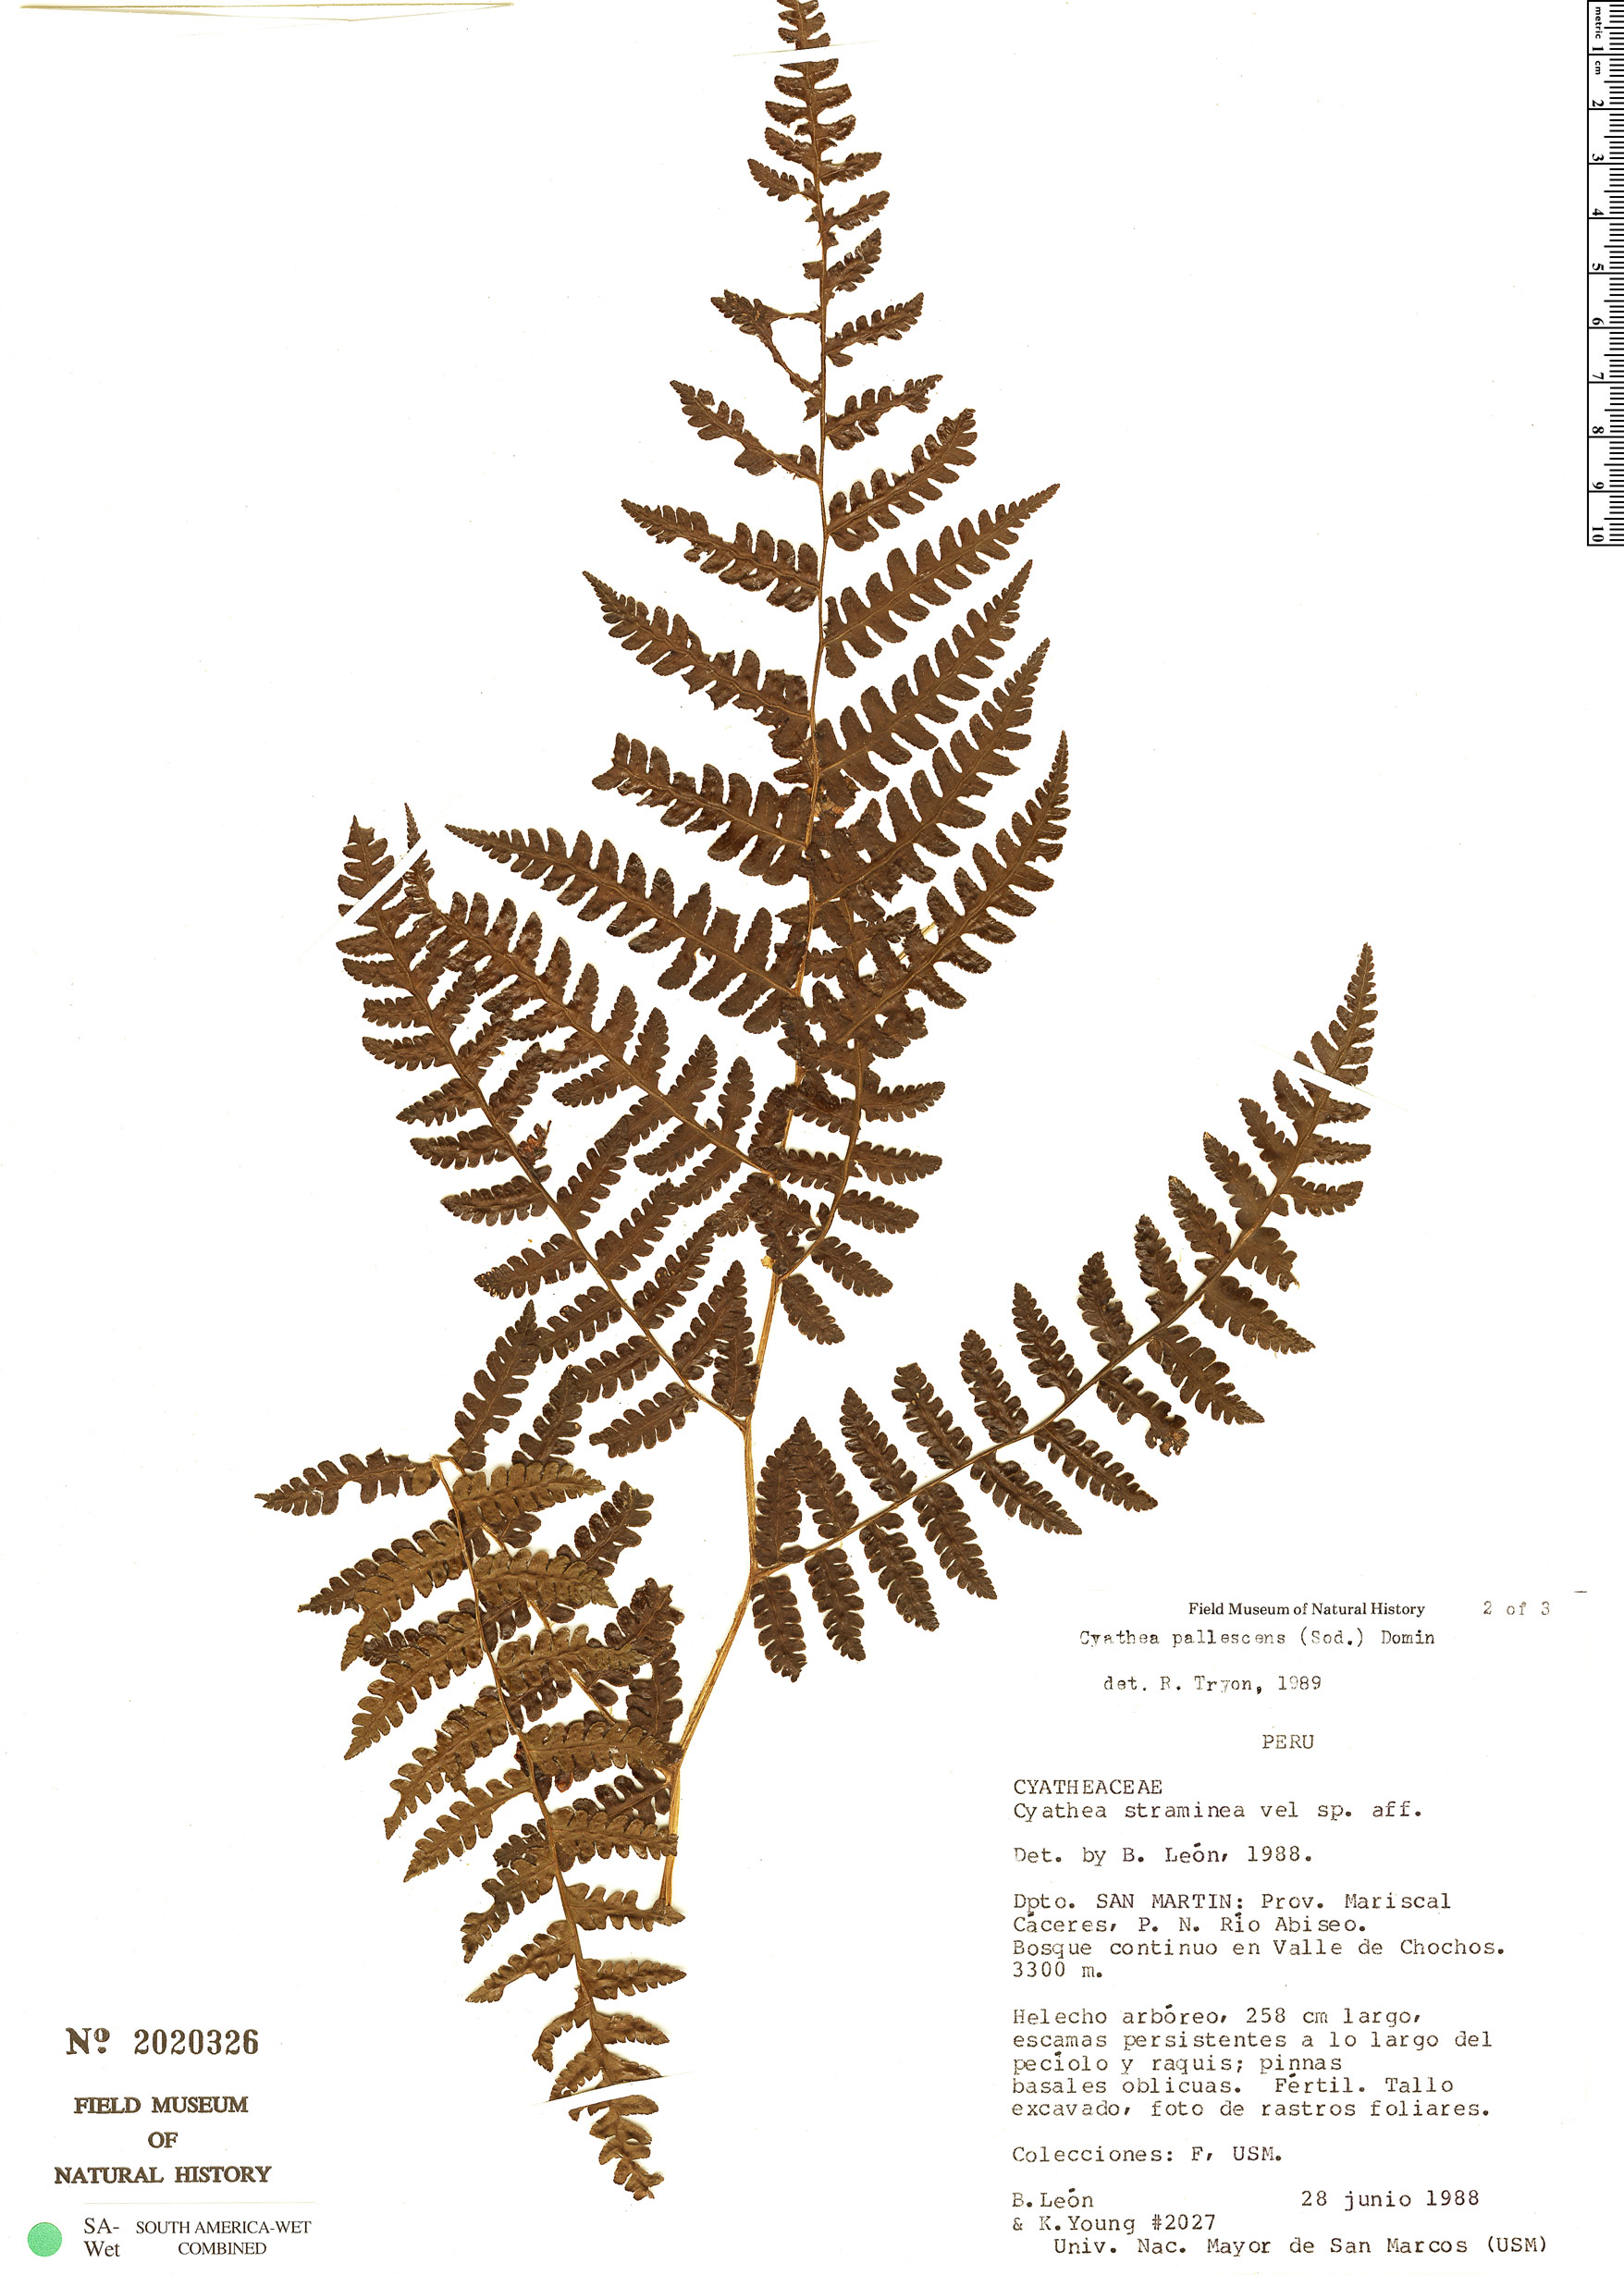 Espécime: Cyathea straminea